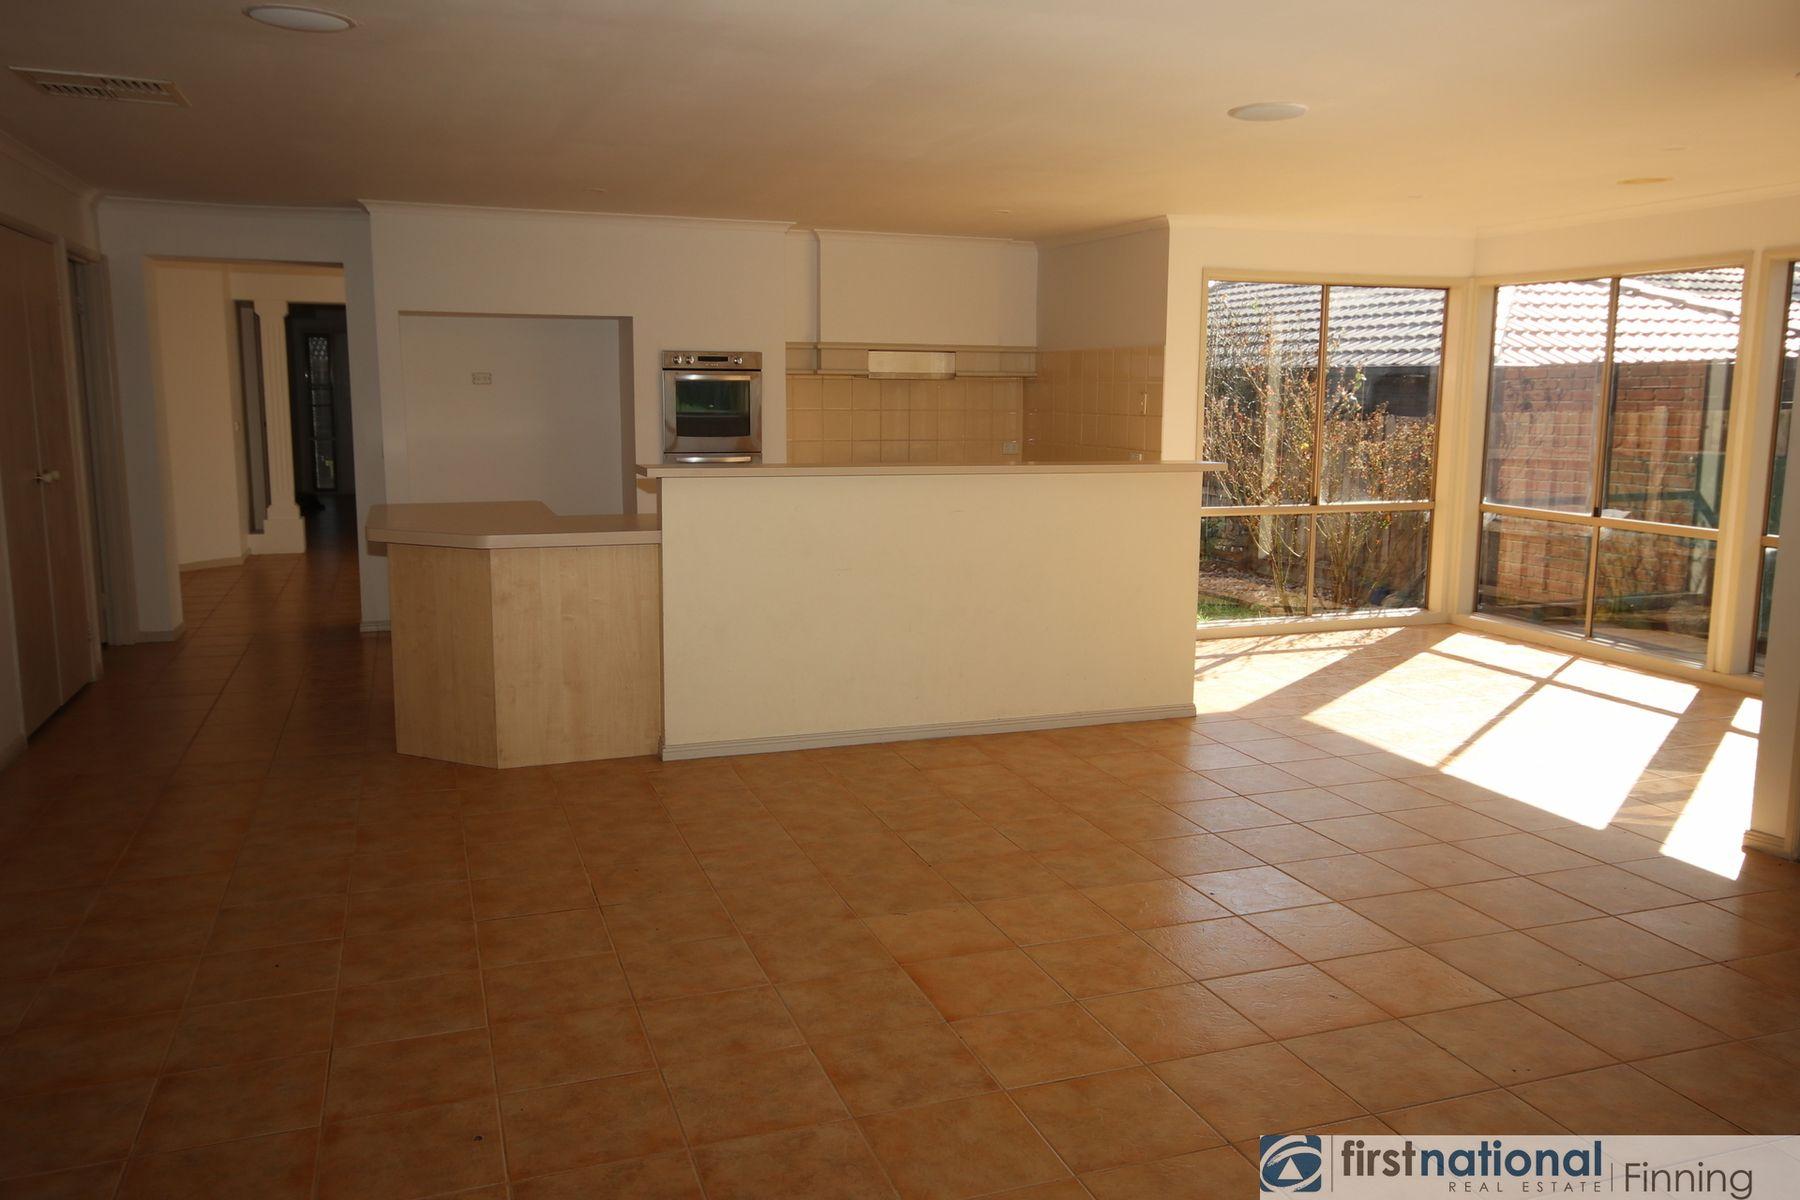 13 Borrowdale, Cranbourne West, VIC 3977